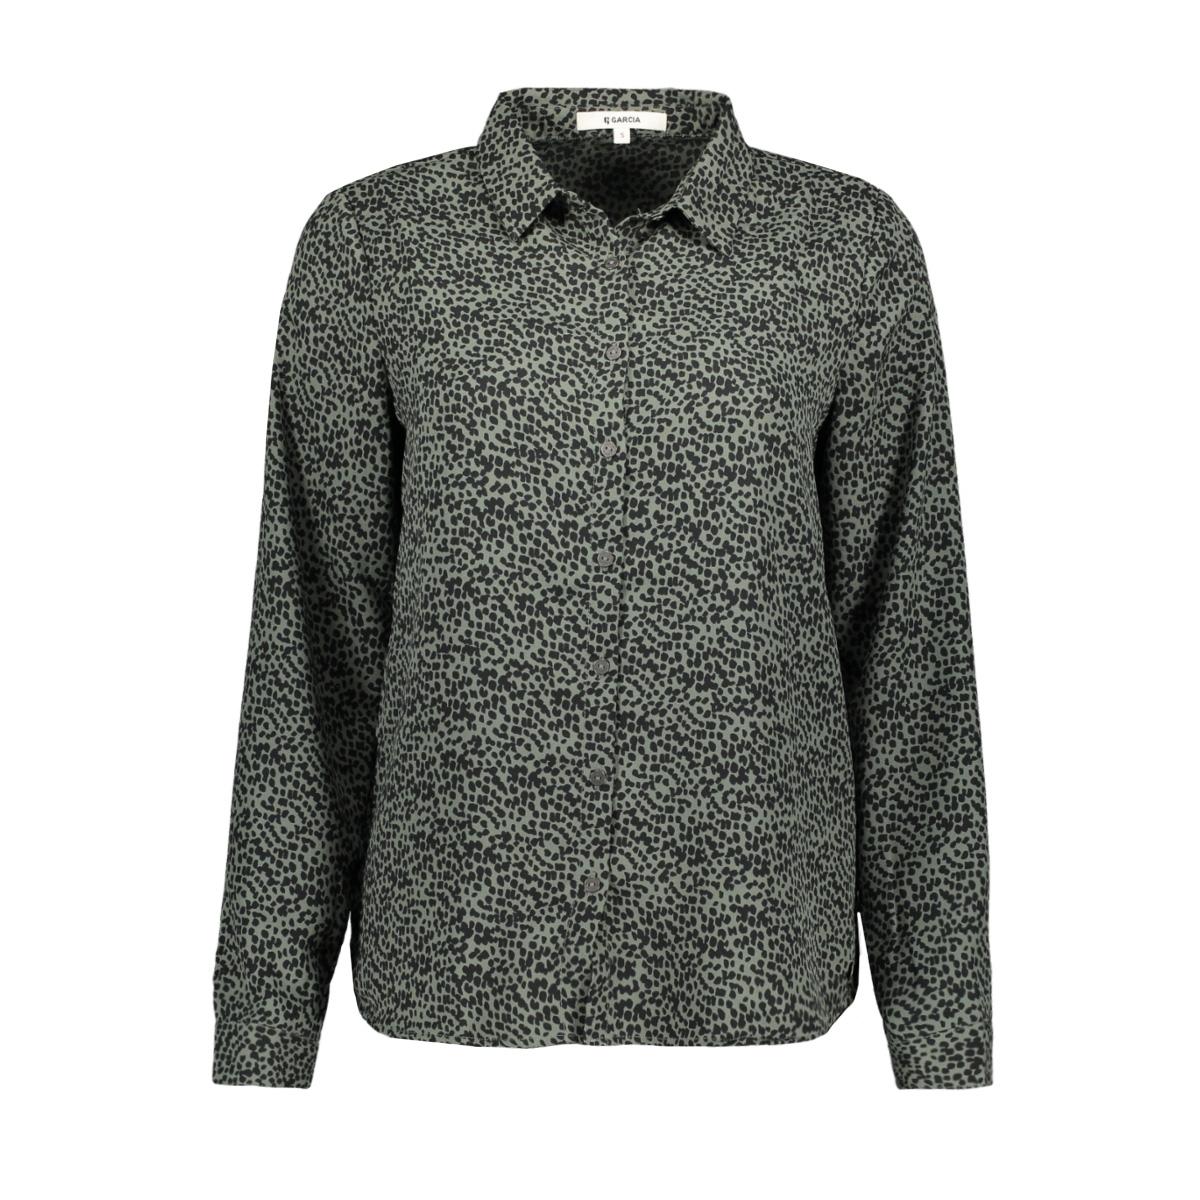 blouse pg900908 garcia blouse 1690 beetle